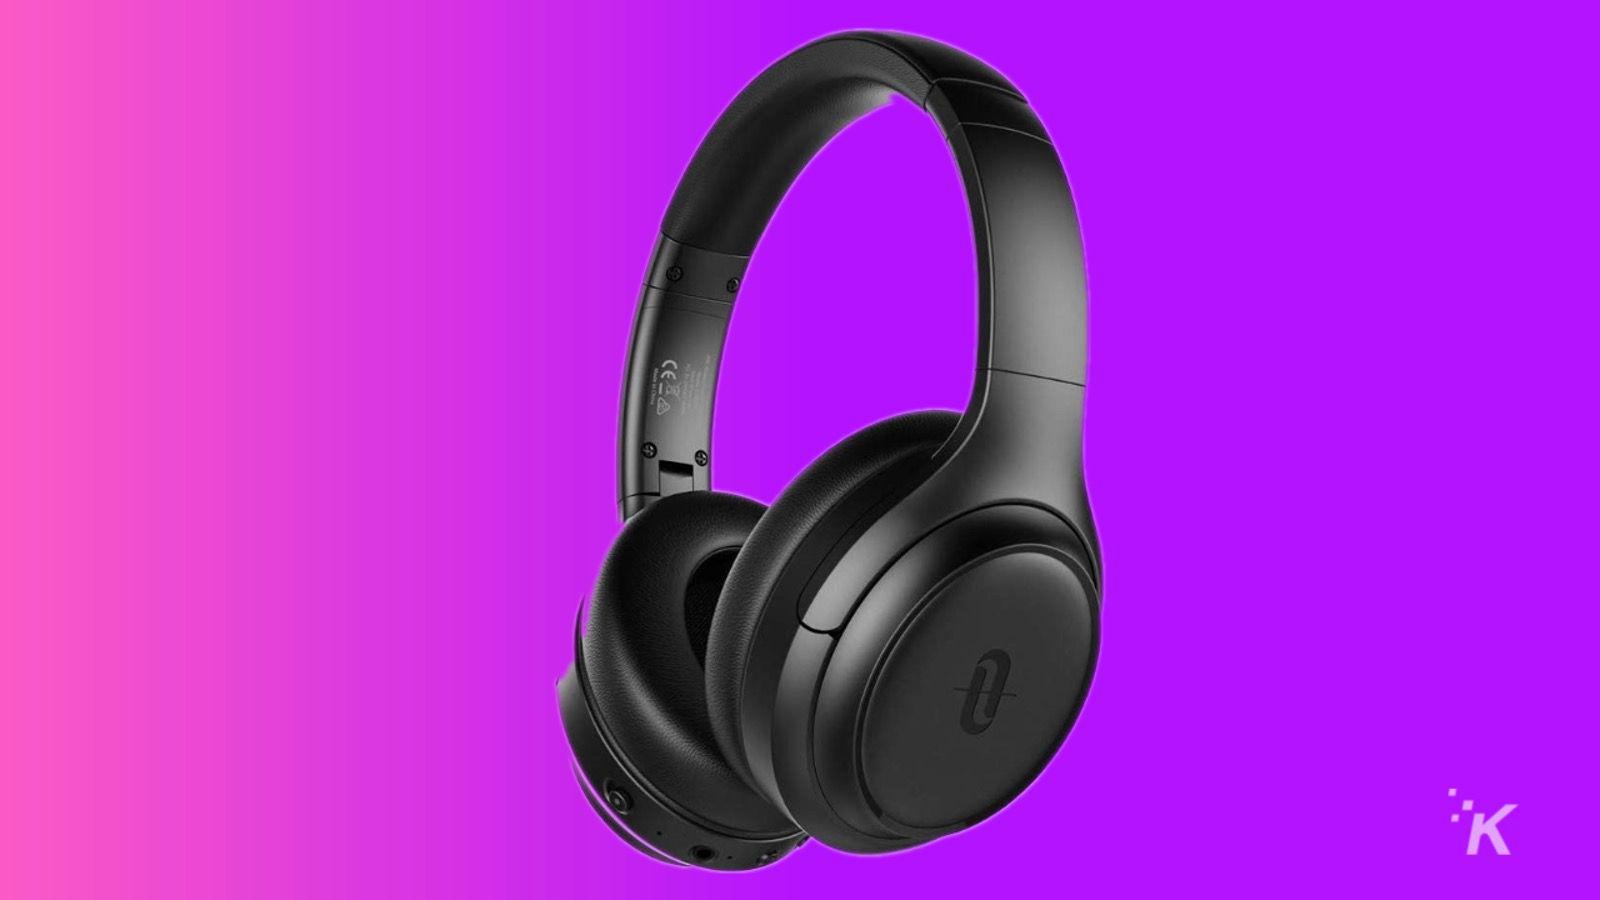 taotronics soundsurge noise canceling headphones